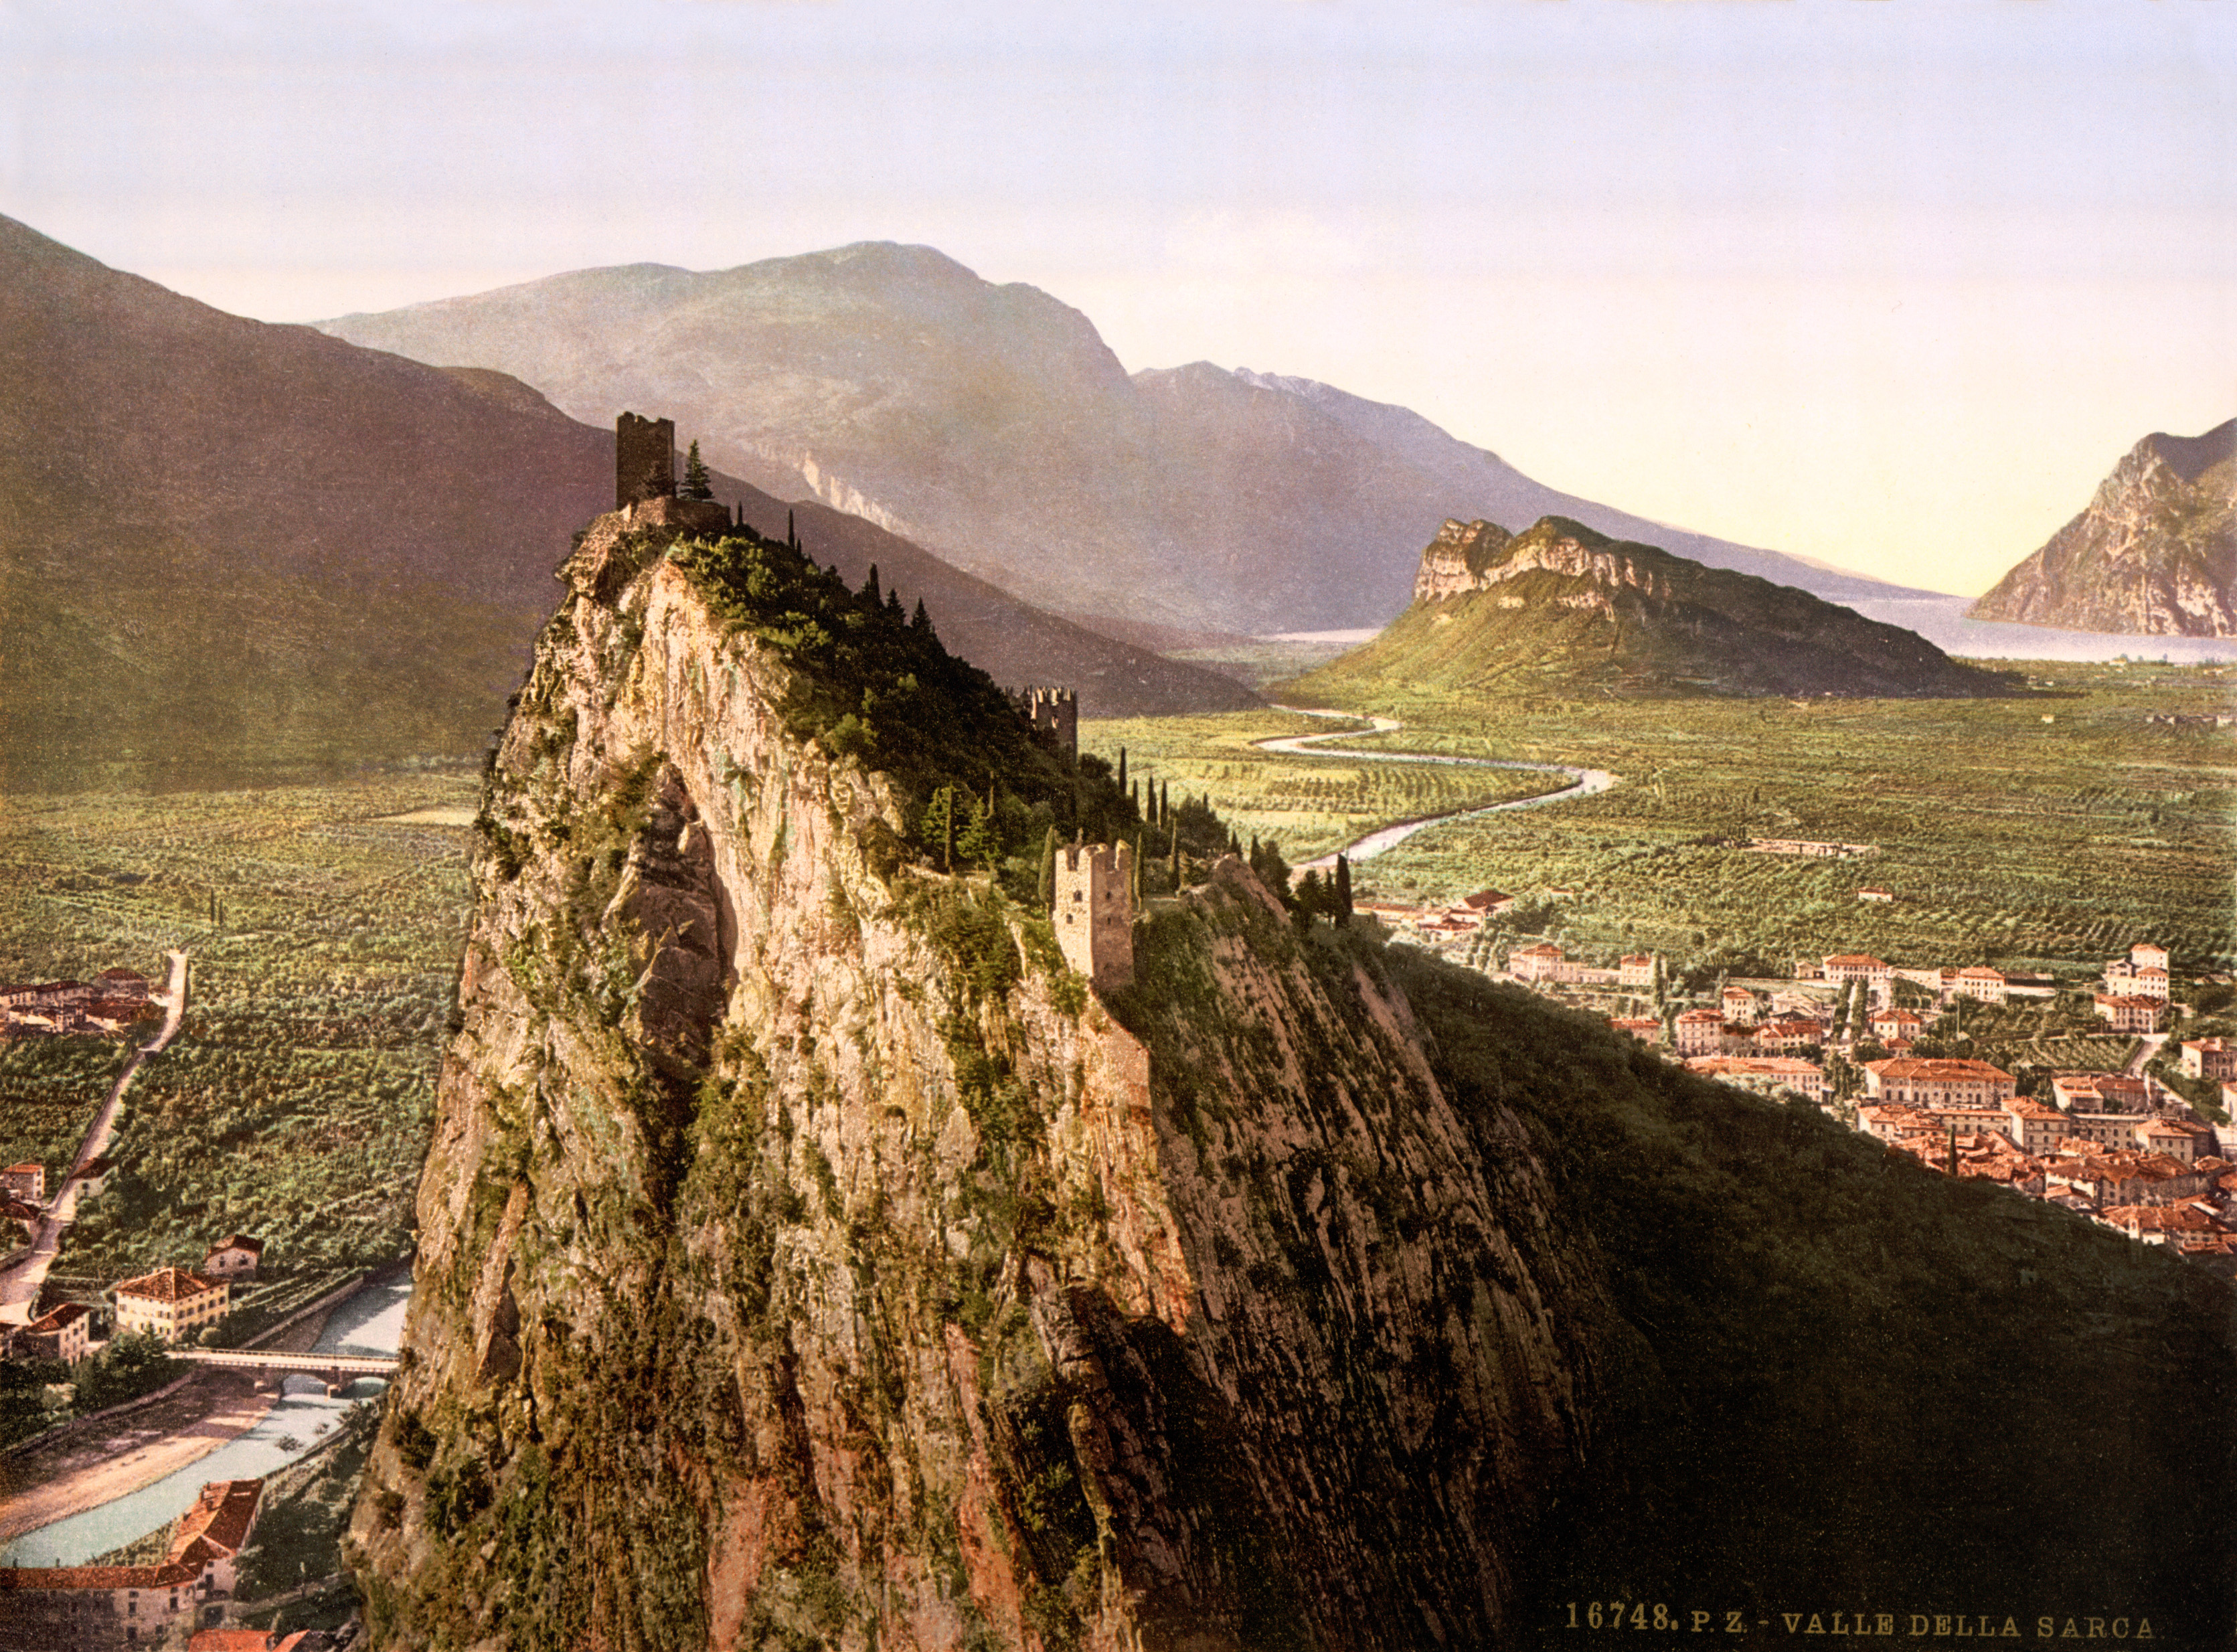 Arco Italy  city pictures gallery : ... the Sarca near Arco, Trento, Italy, ca. 1899 Wikimedia Commons